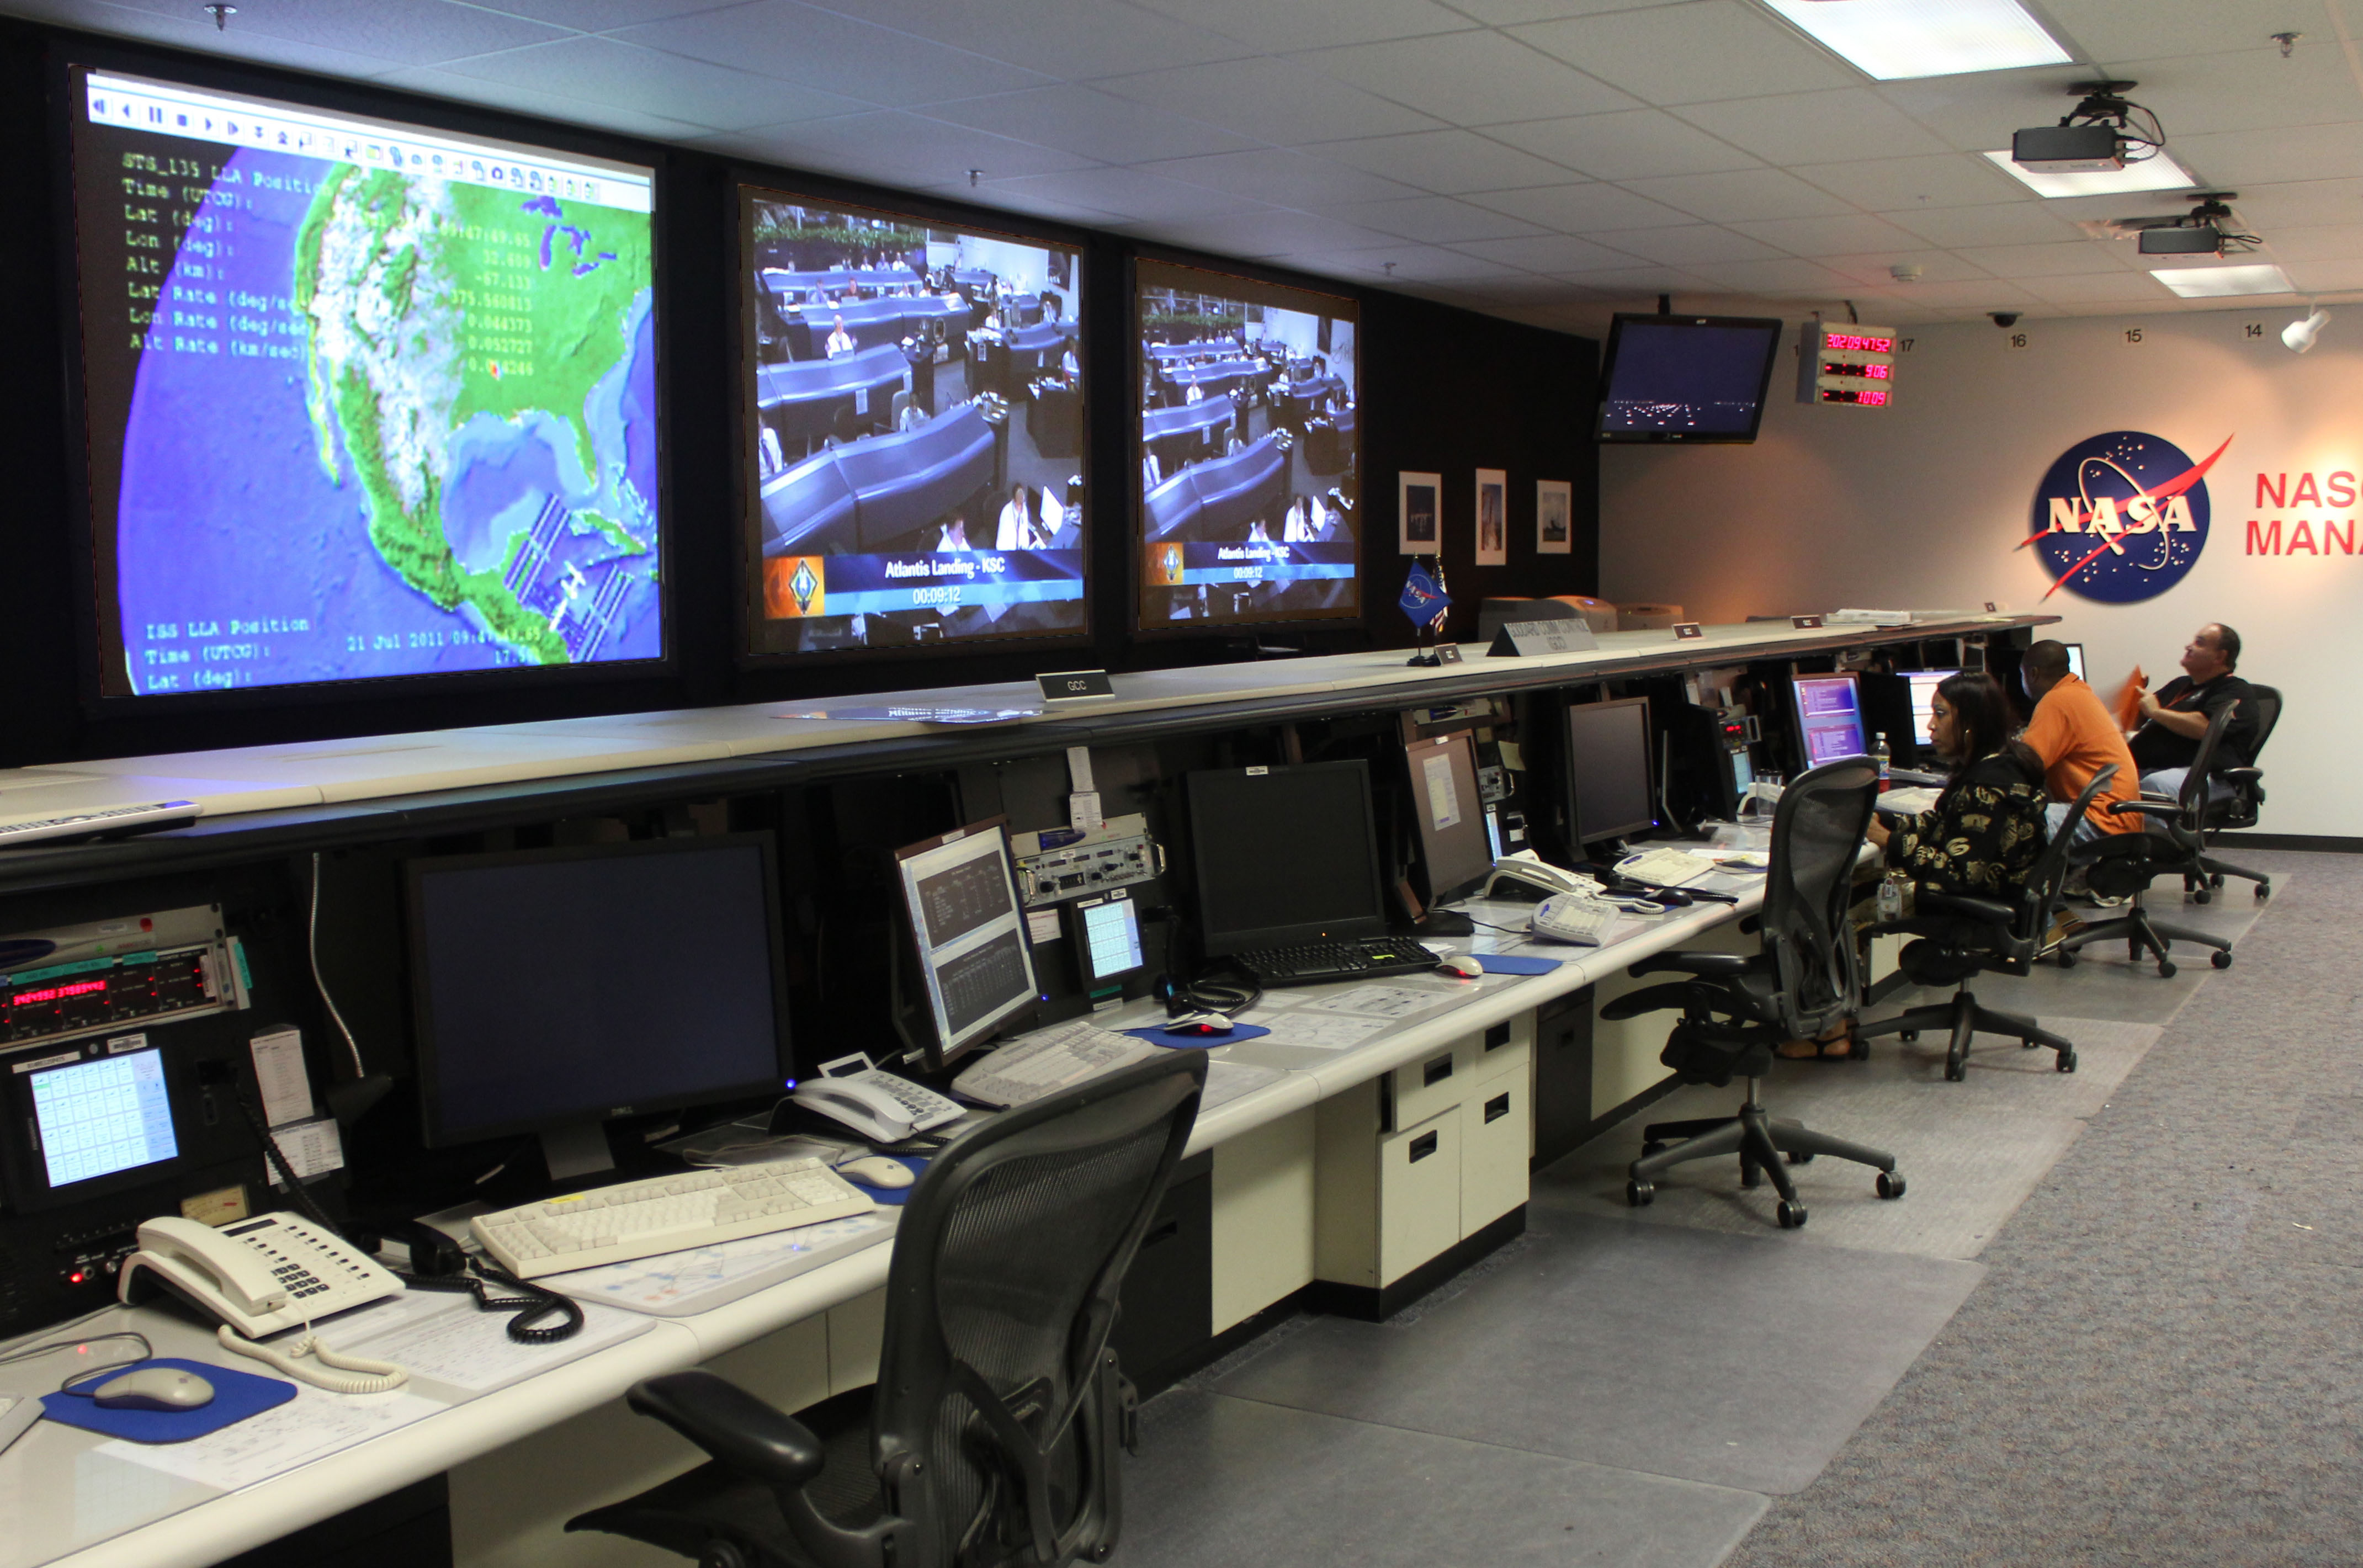 nasa space controls - photo #6